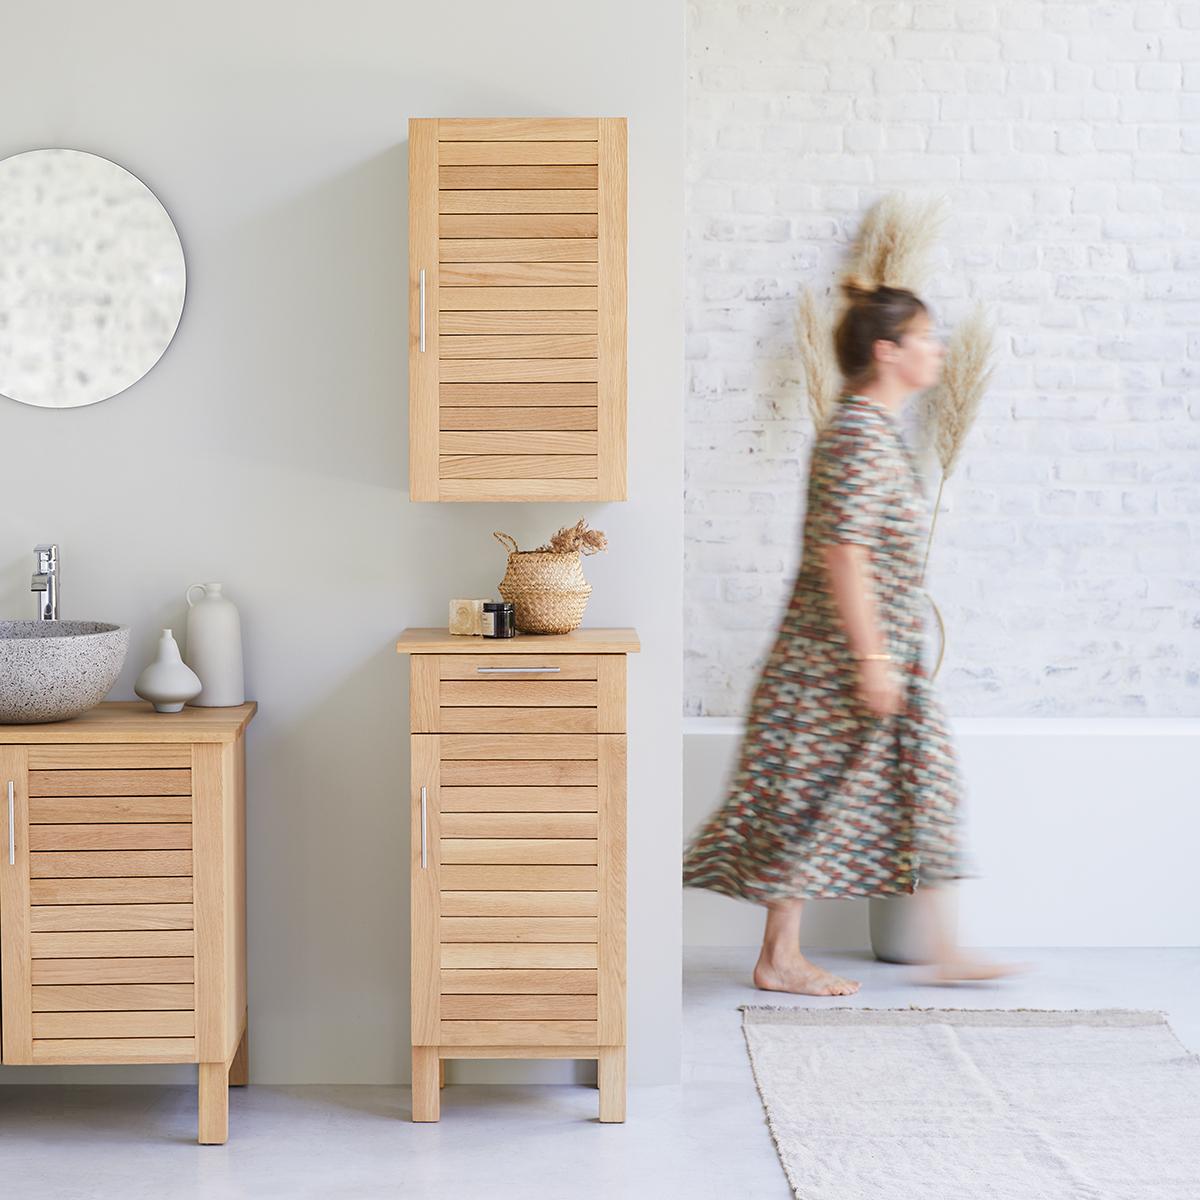 Soho solid oak bathroom Storage set